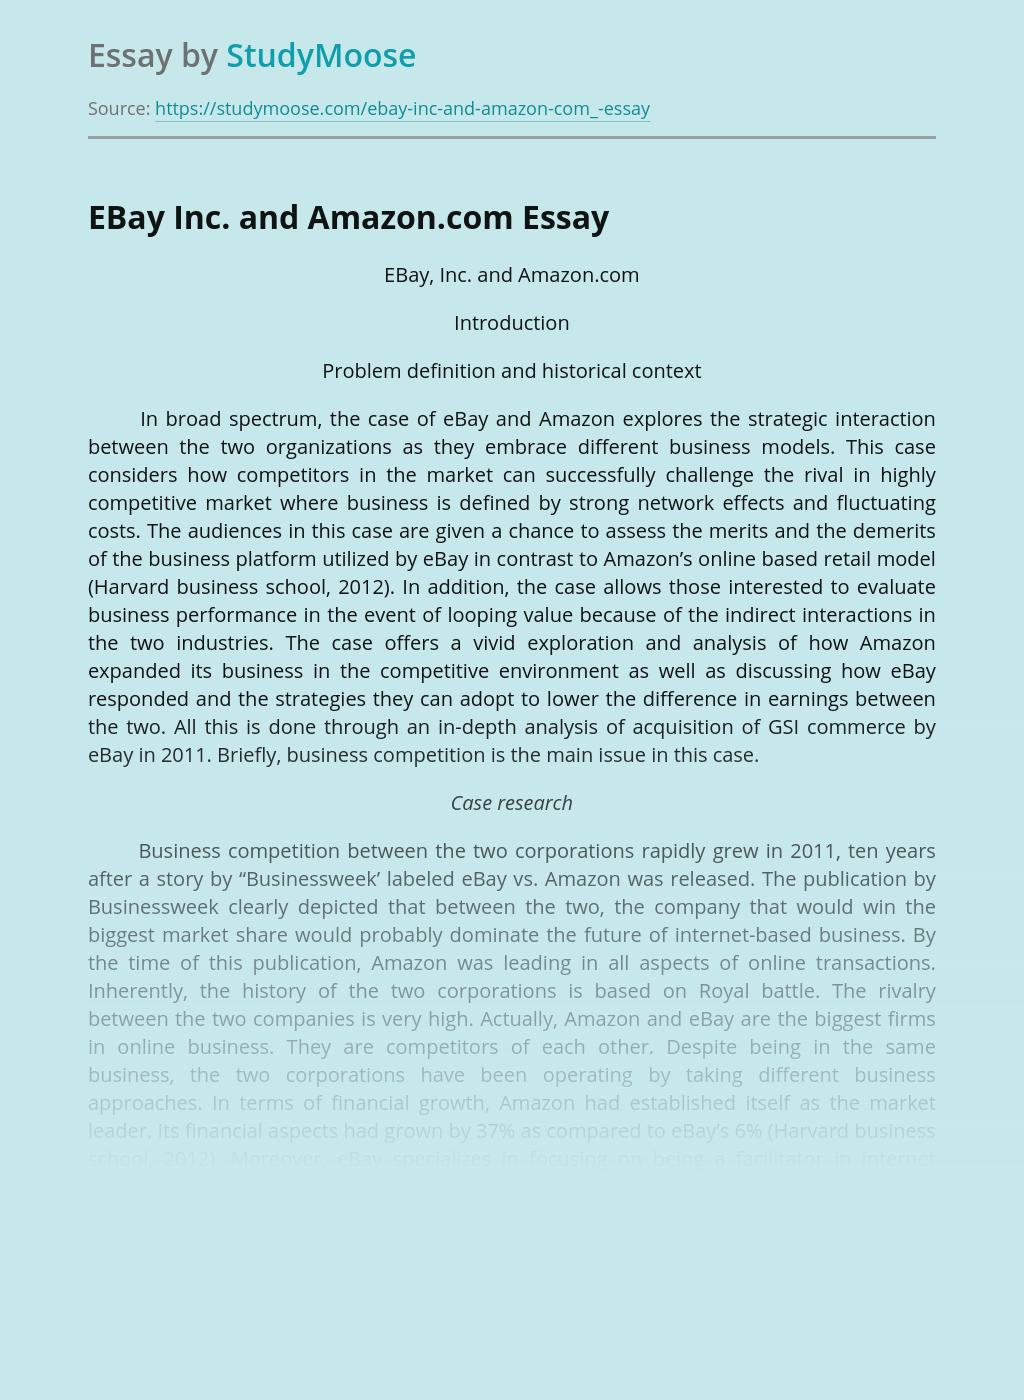 EBay Inc and Amazon